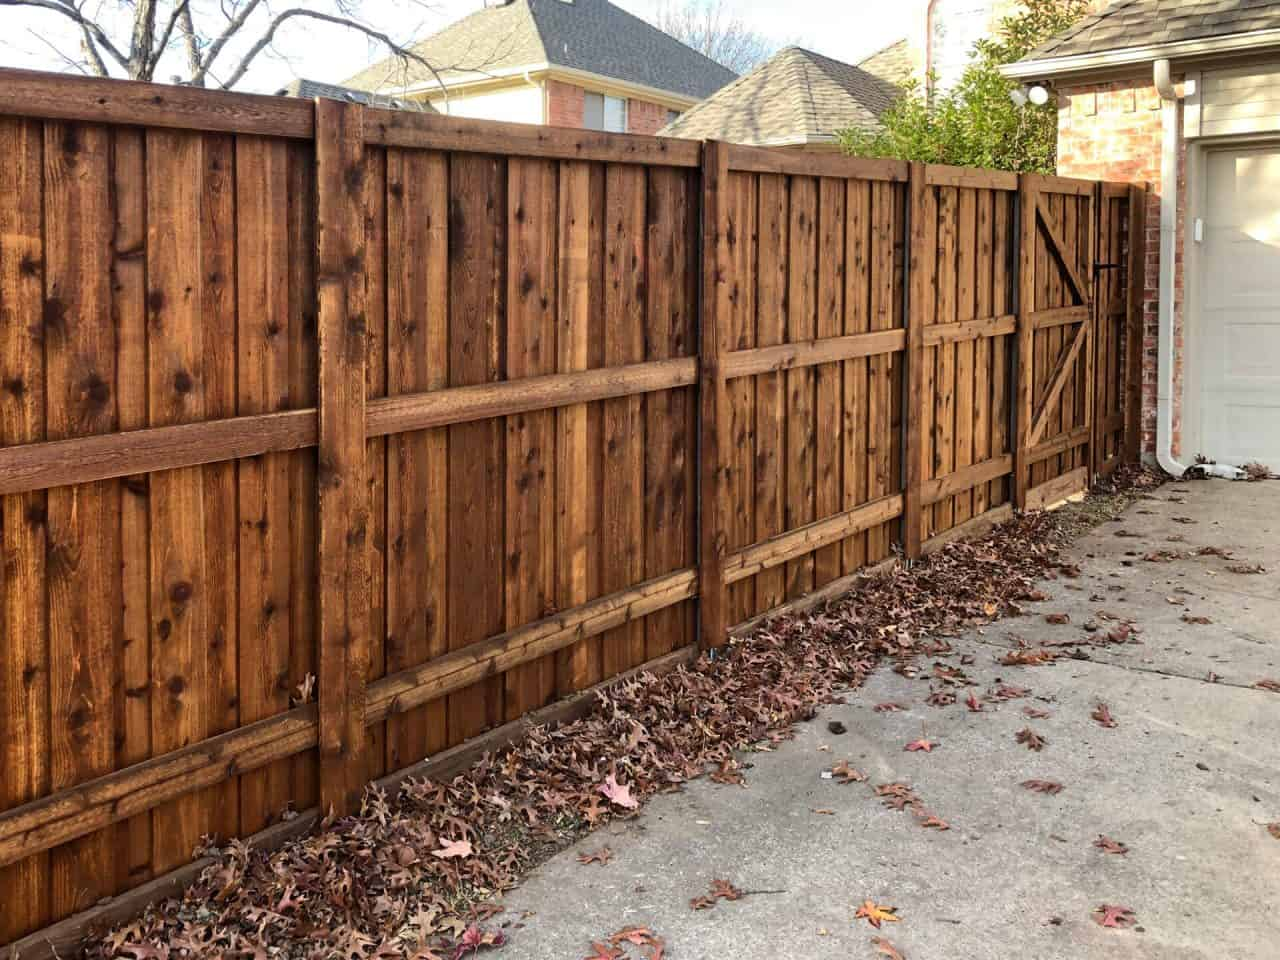 https://www.superiorfenceandrail.com/wp-content/uploads/2019/11/Master-Series-Wood-Fencing-18-1280x960.jpg